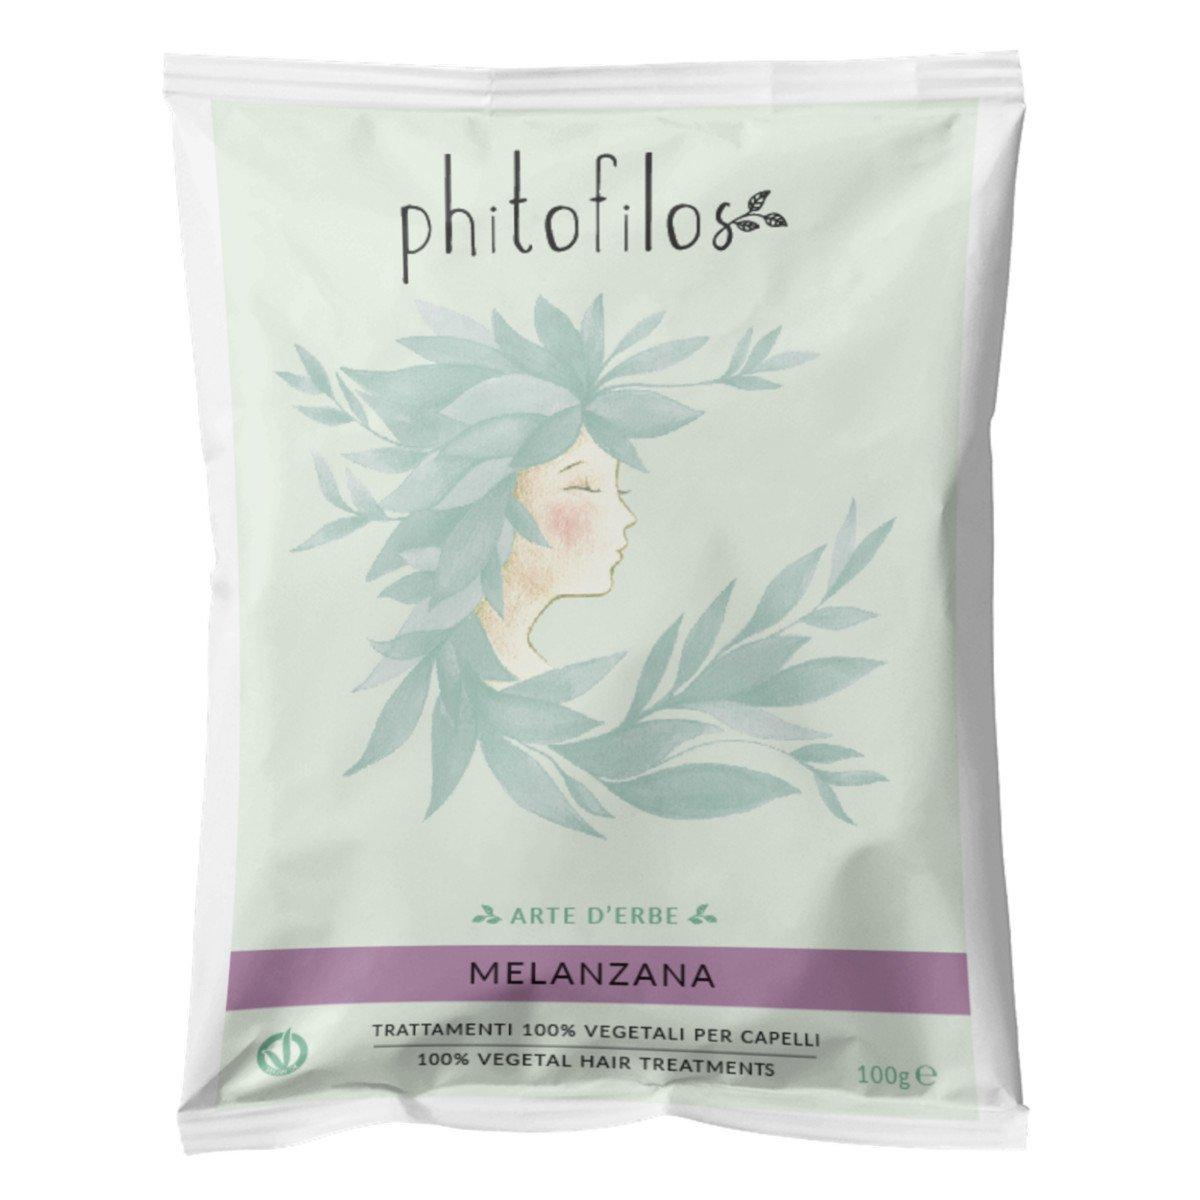 Miscela Melanzana Phitofilos tintura riflessante naturale